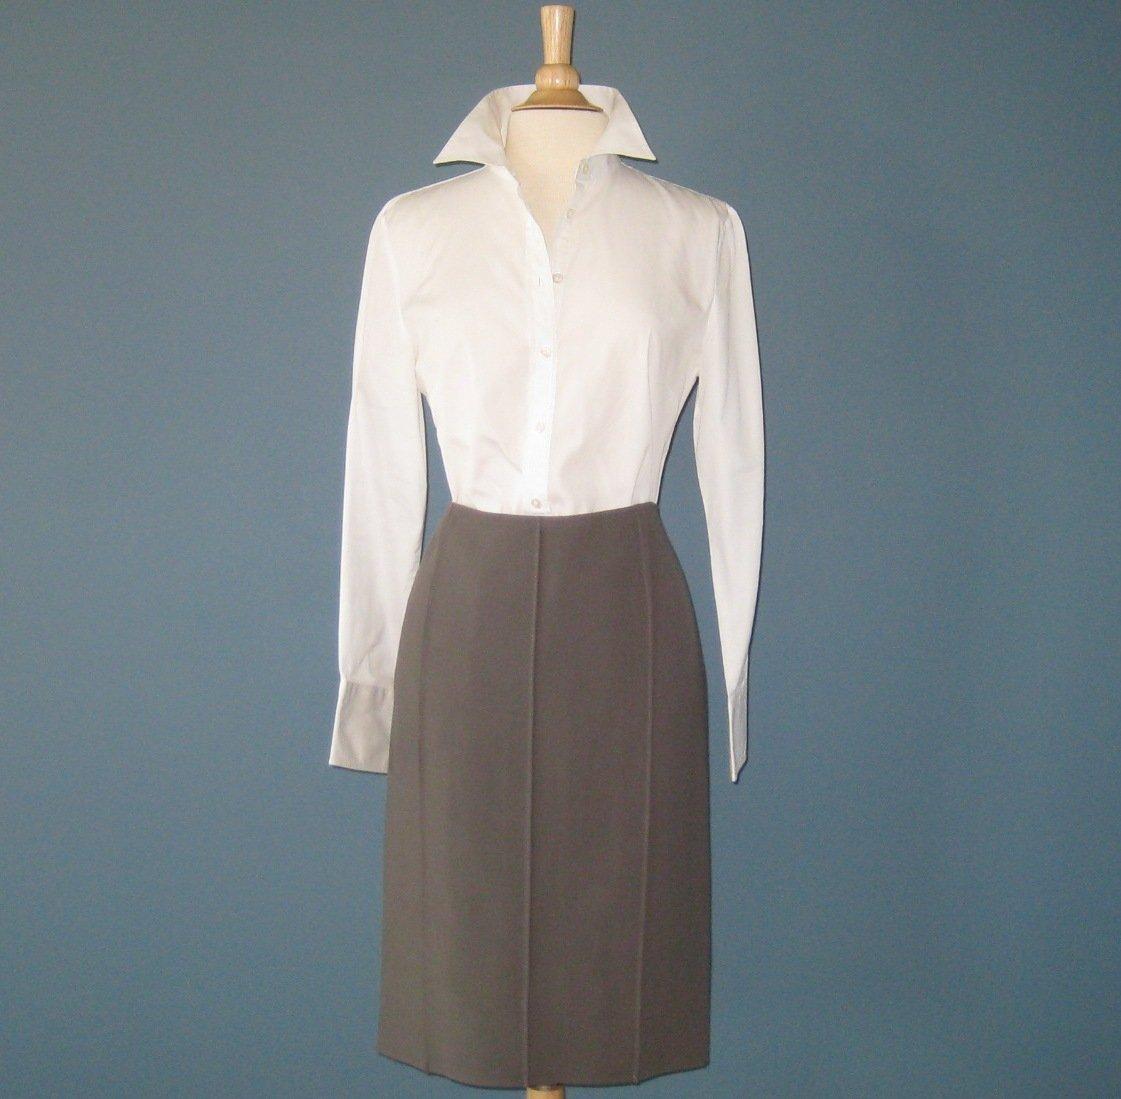 NWT Charles Nolan Cement (Grayish Mauve) 100% Wool Straight Skirt - 12